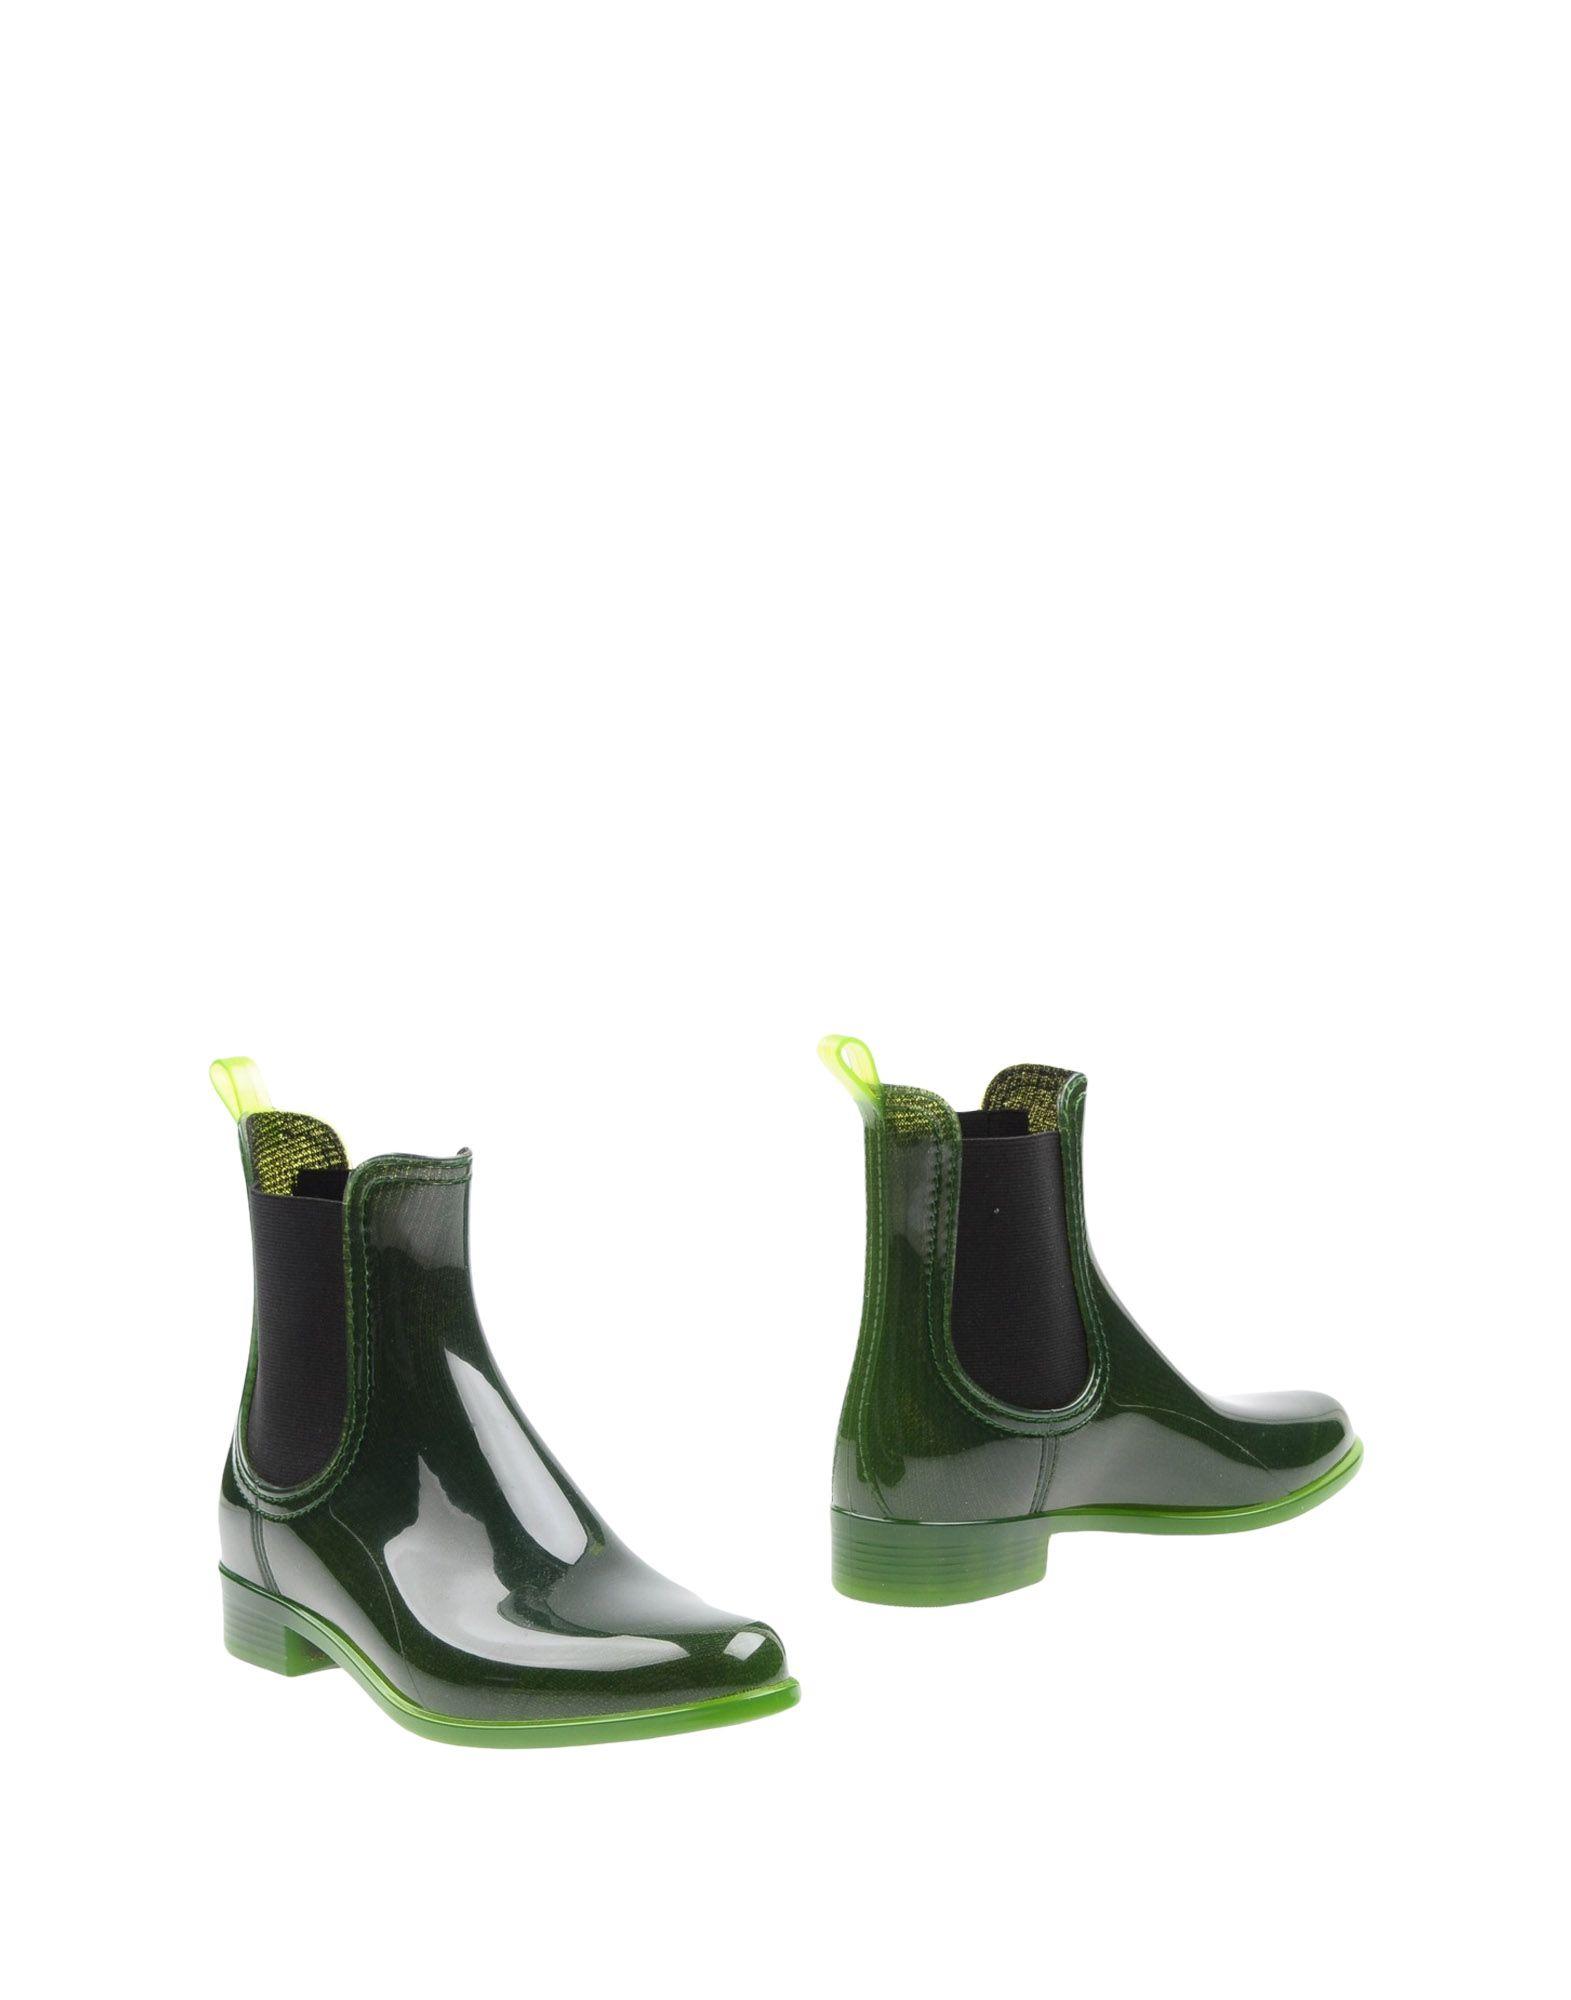 JEFFREY CAMPBELL Полусапоги и высокие ботинки jeffrey campbell полусапоги и высокие ботинки